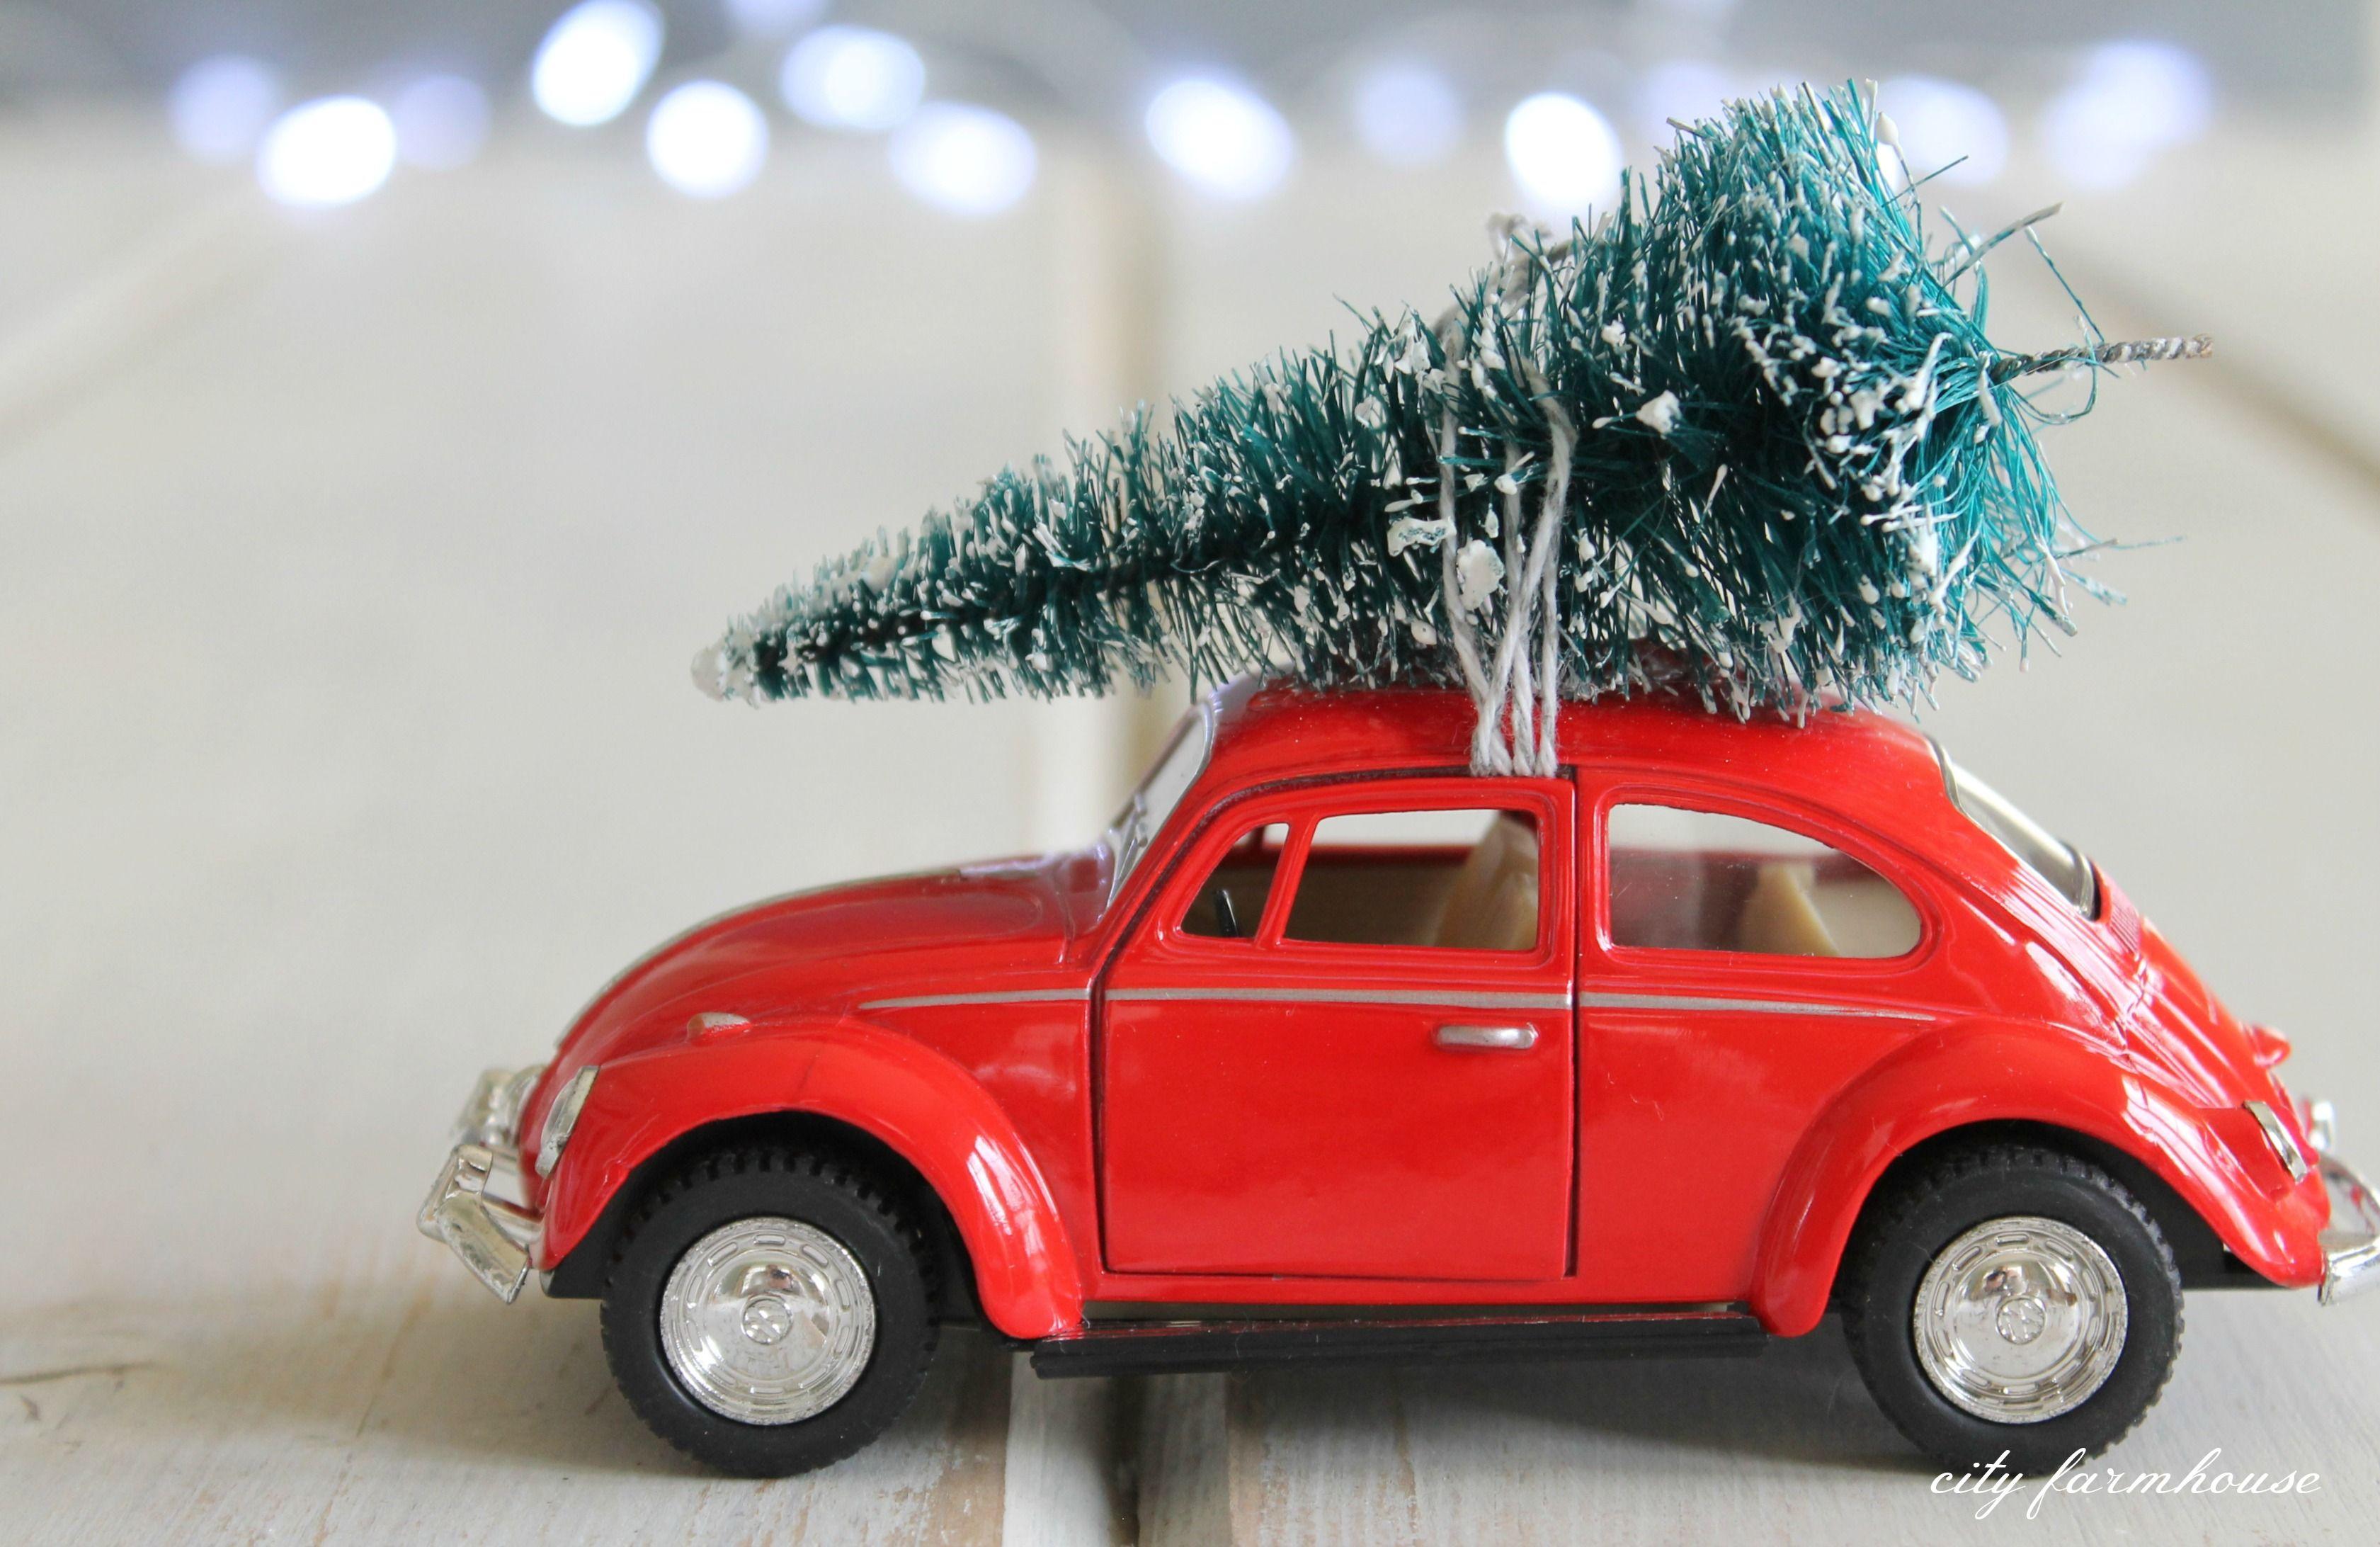 16x Neutrale Kerstdecoraties : Diy gilded woodland animal ornaments christmas pinterest